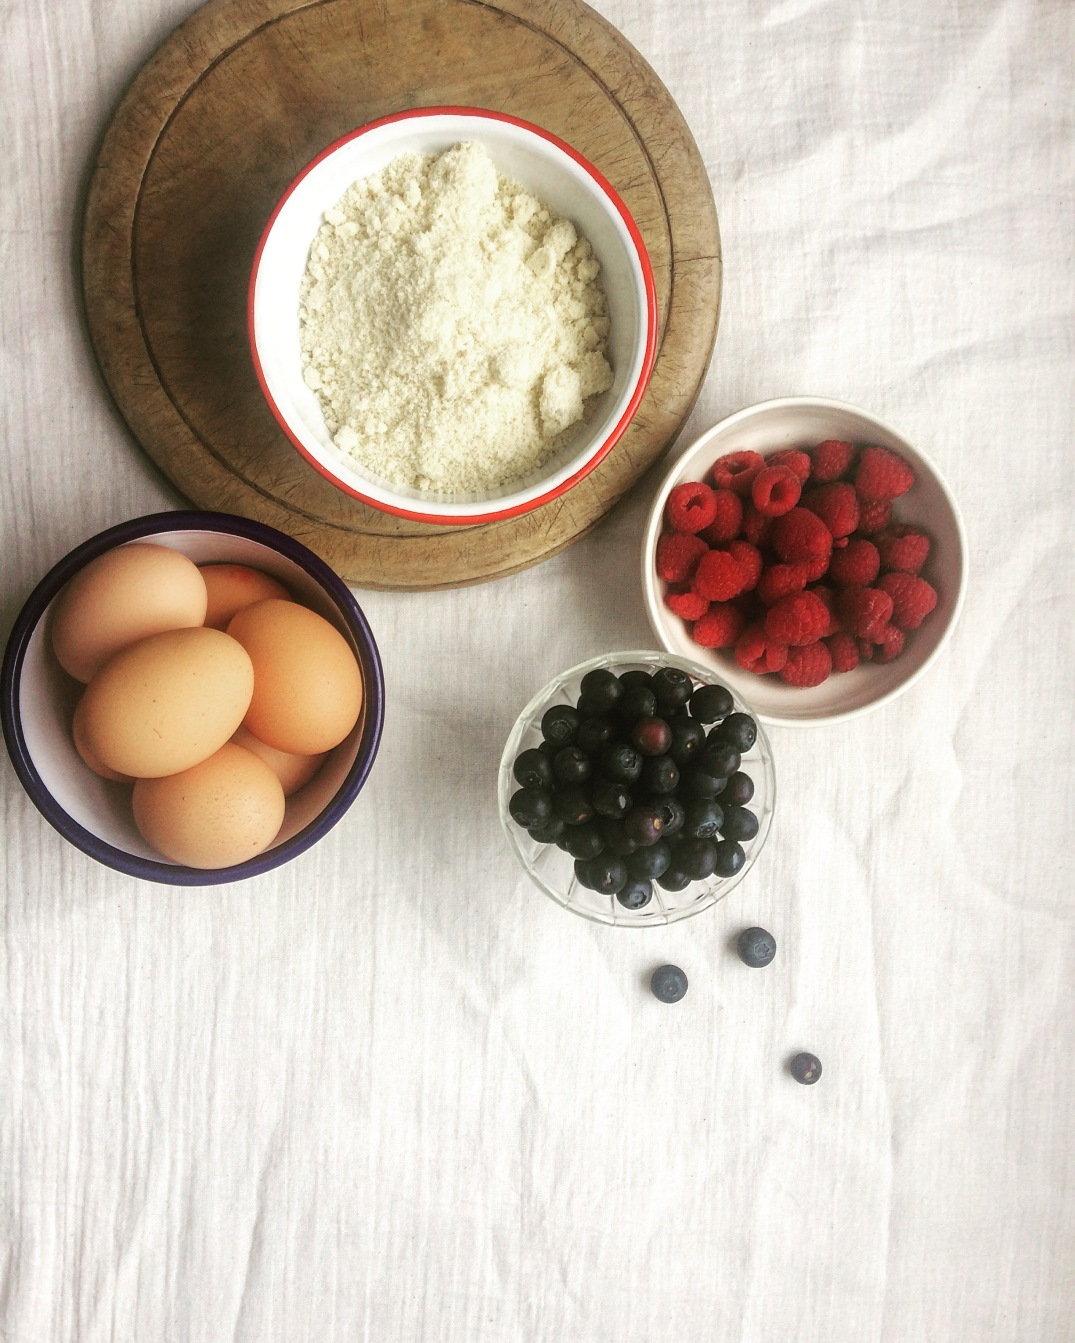 Friand Ingredients - Sky Meadow Bakery blog